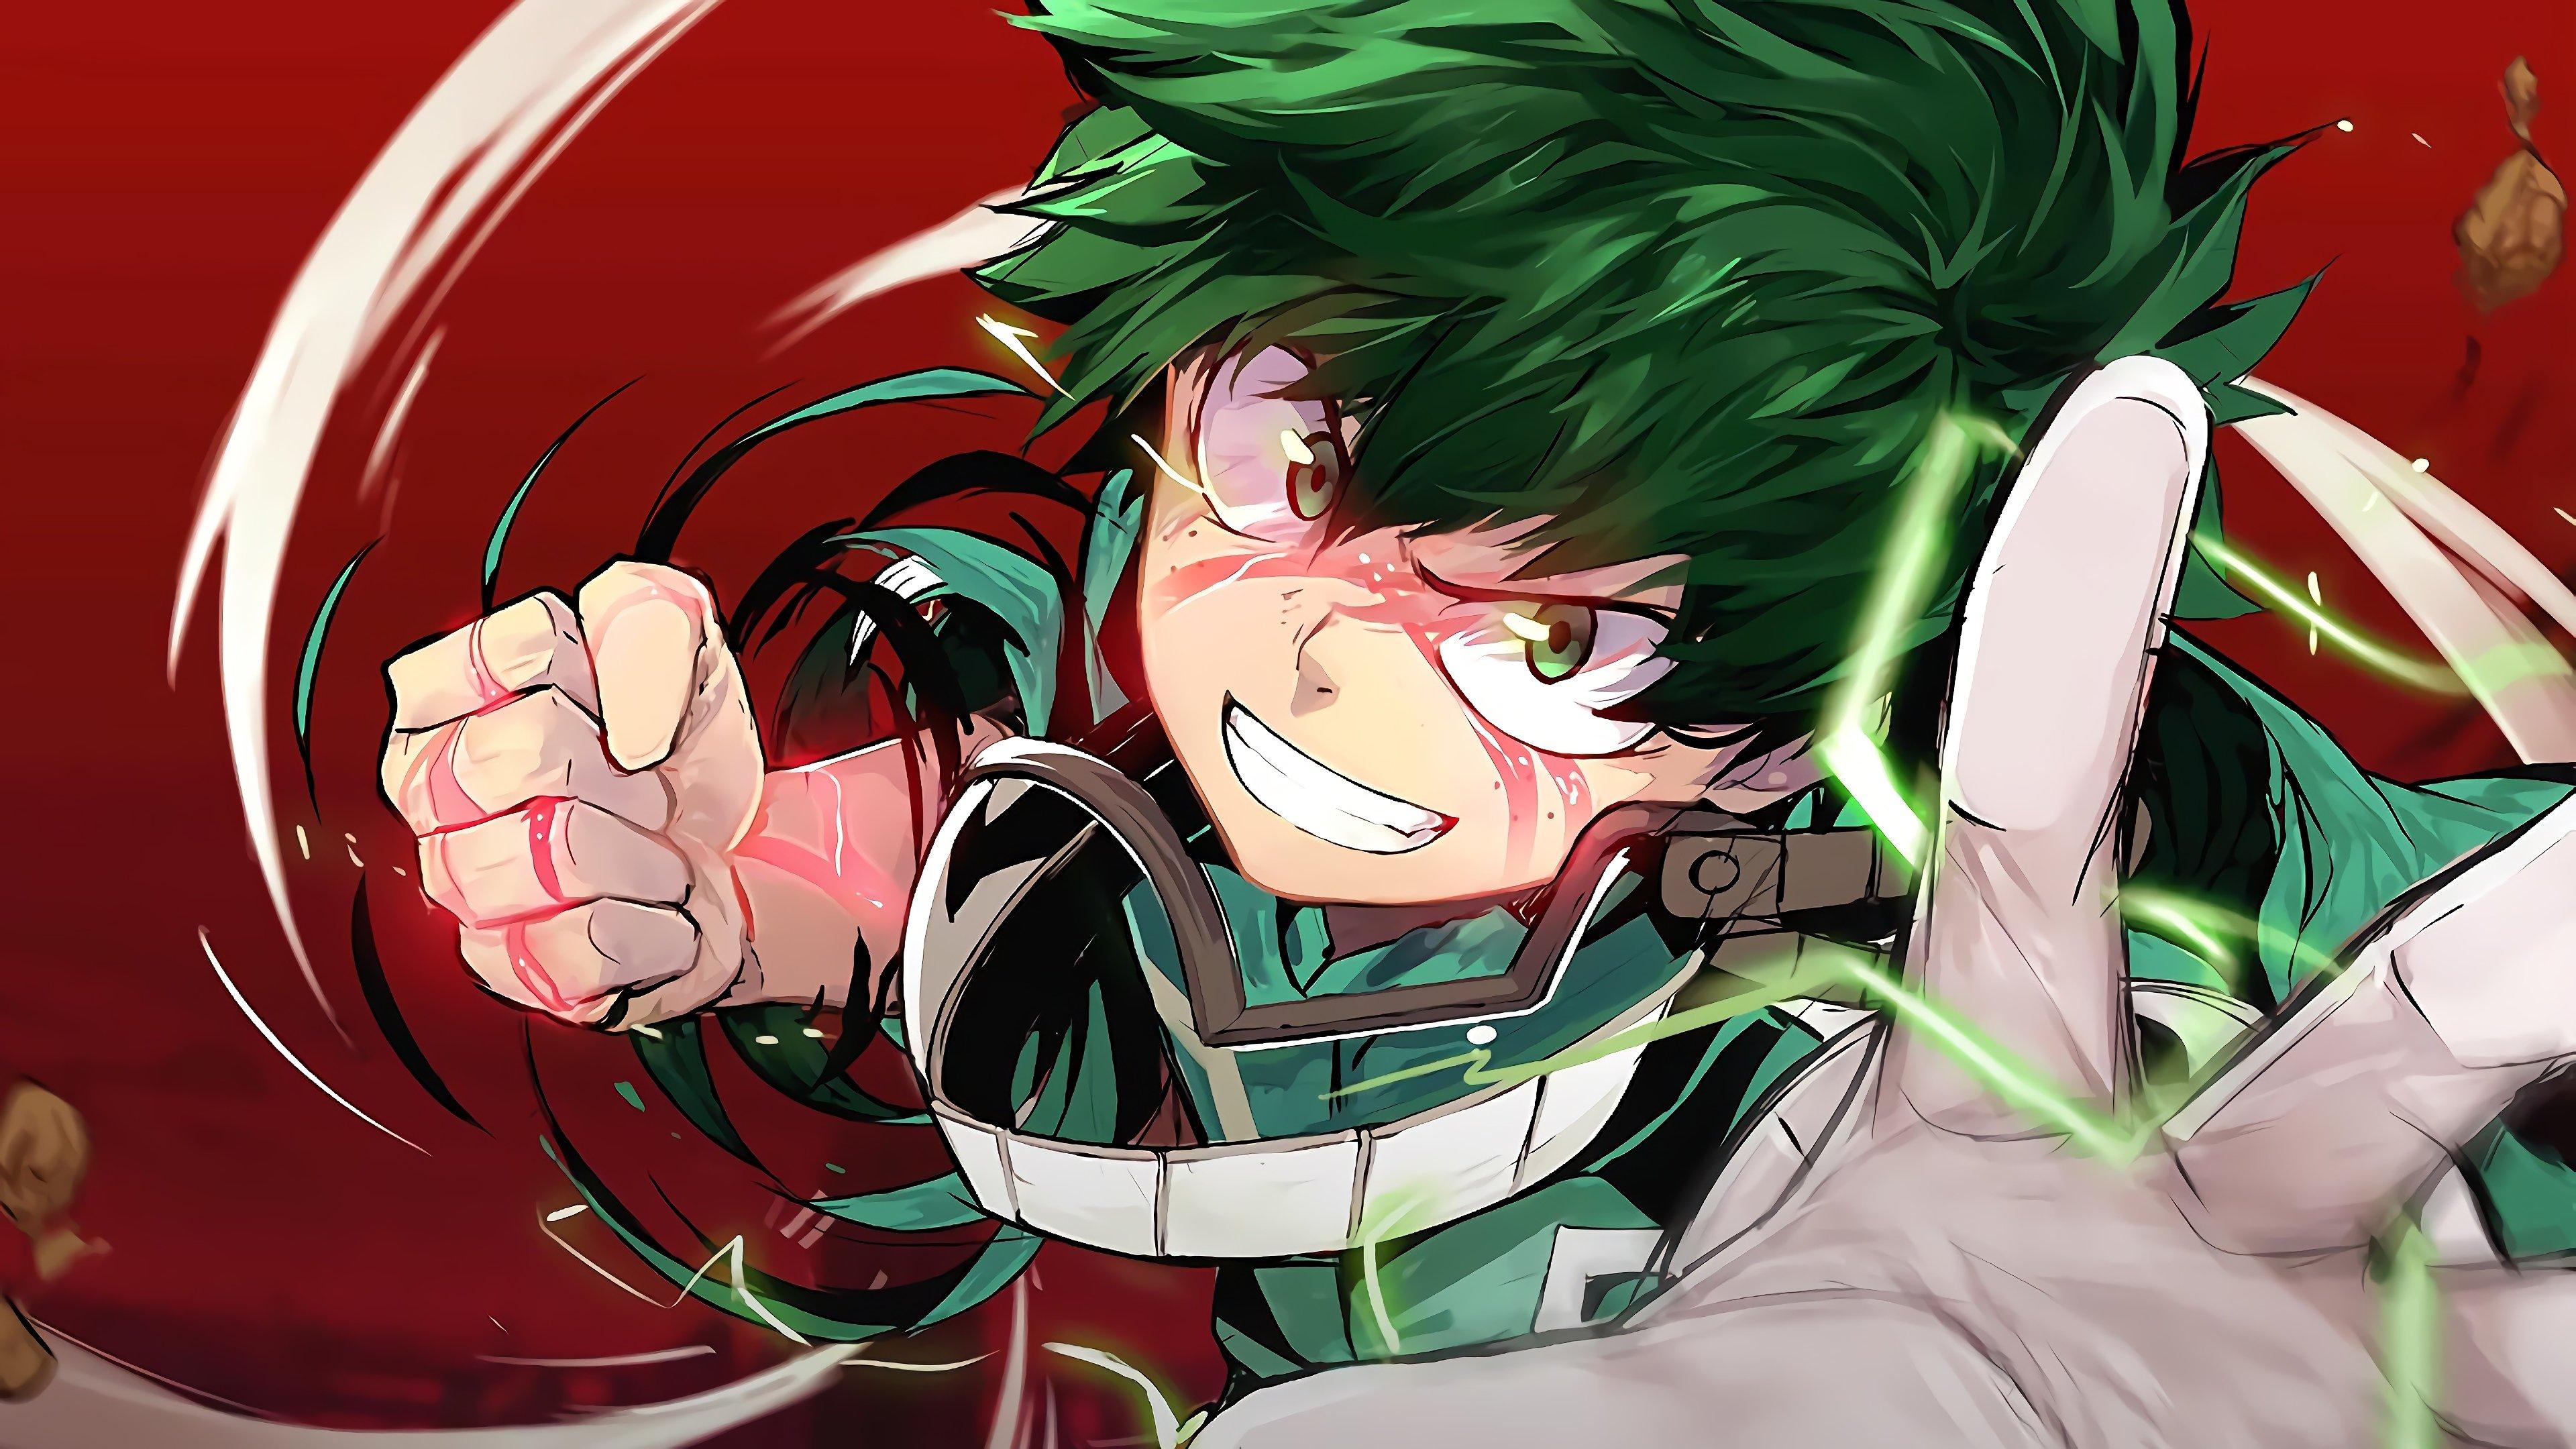 Izuku Midoriya My Hero Academia Anime Wallpaper 4k Ultra Hd